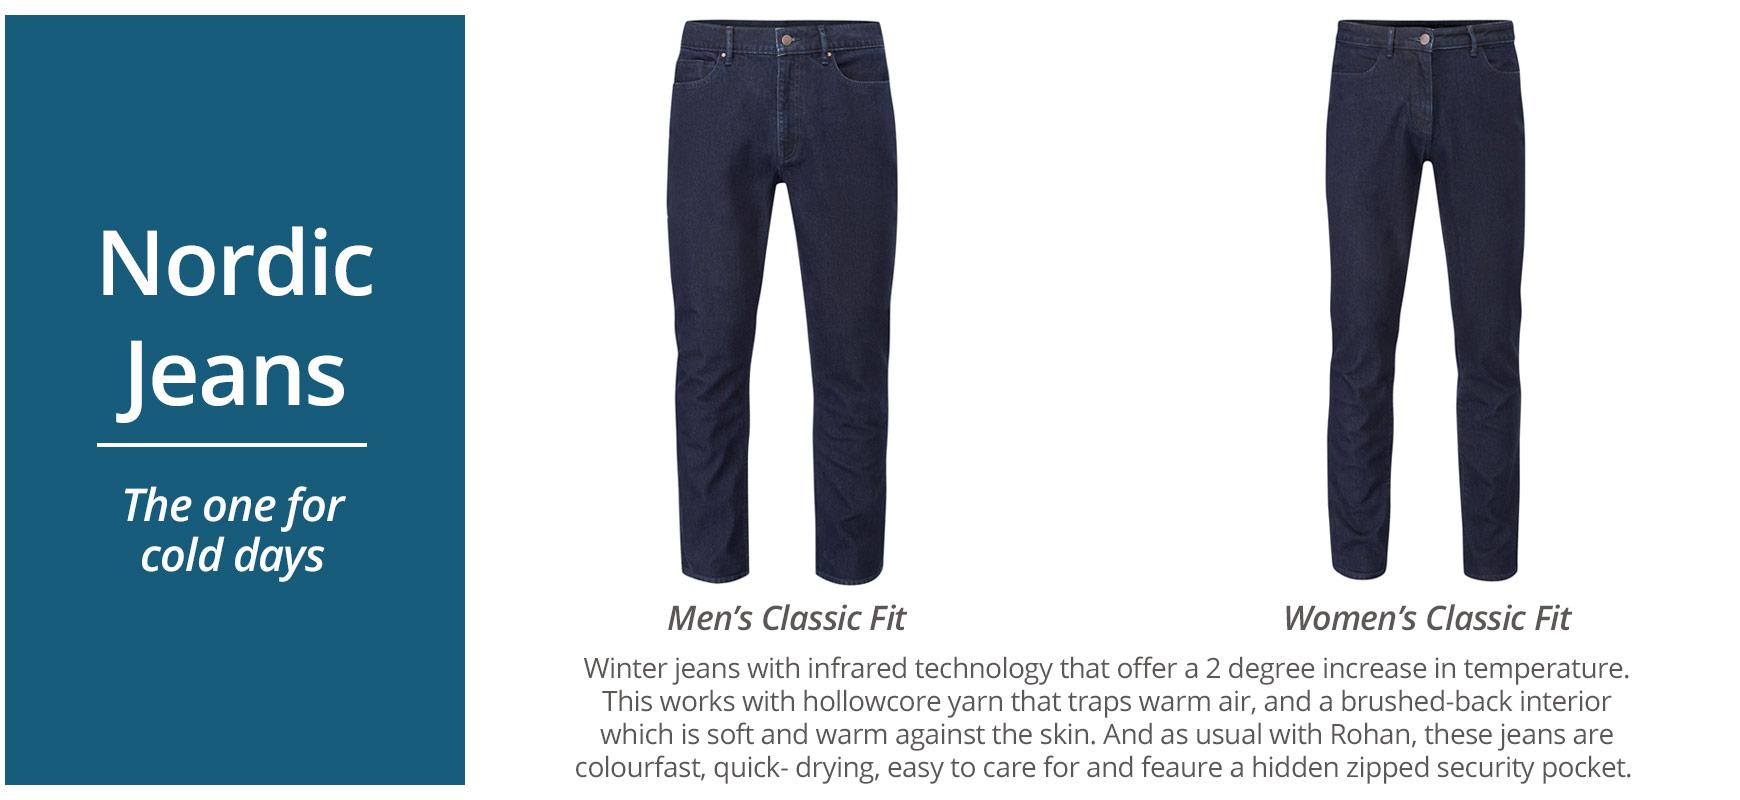 Nordic Jeans